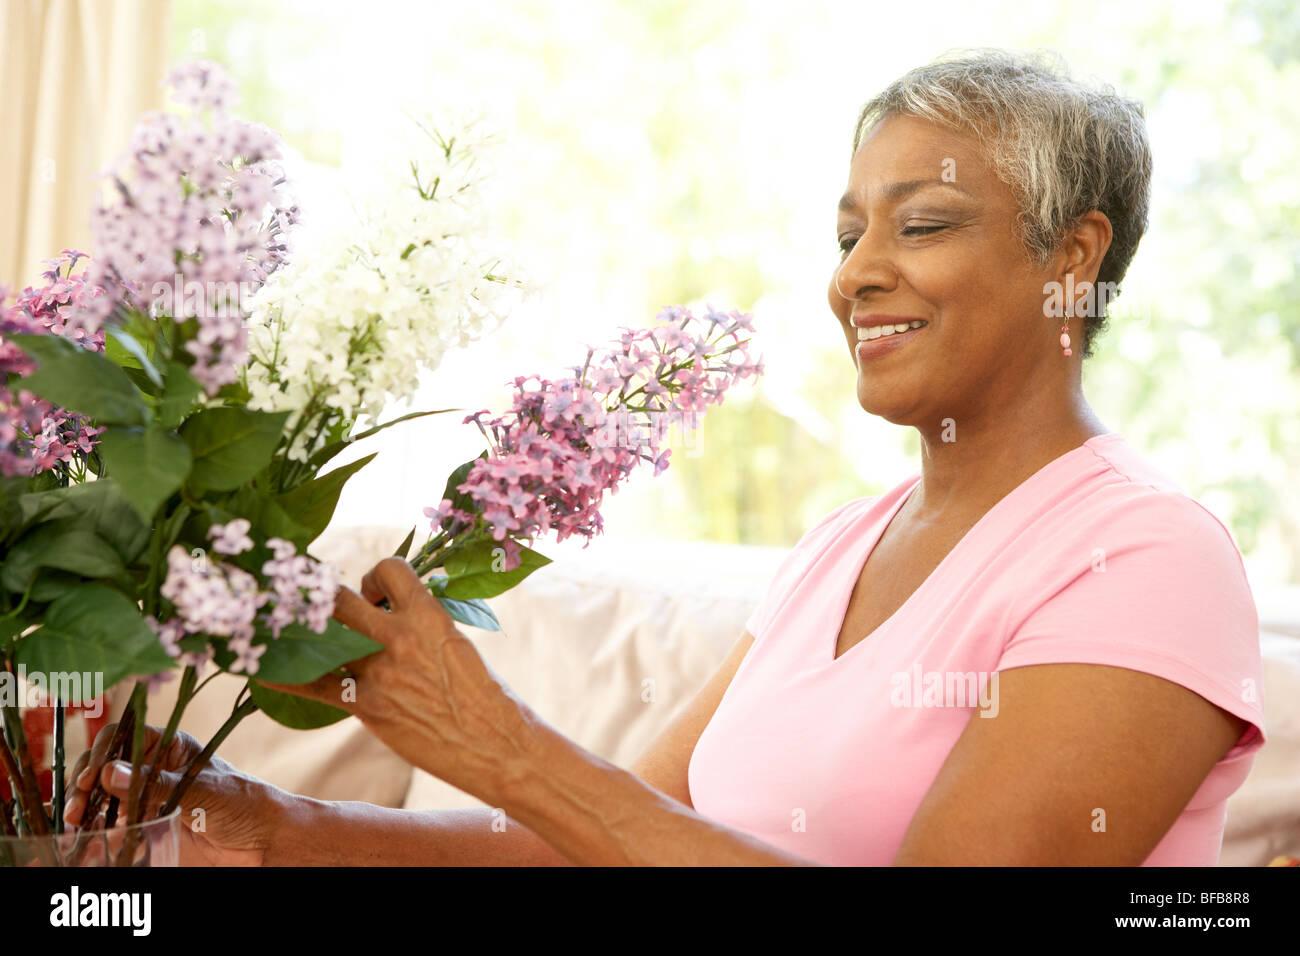 Senior Woman Flower Arranging At Home Stock Photo